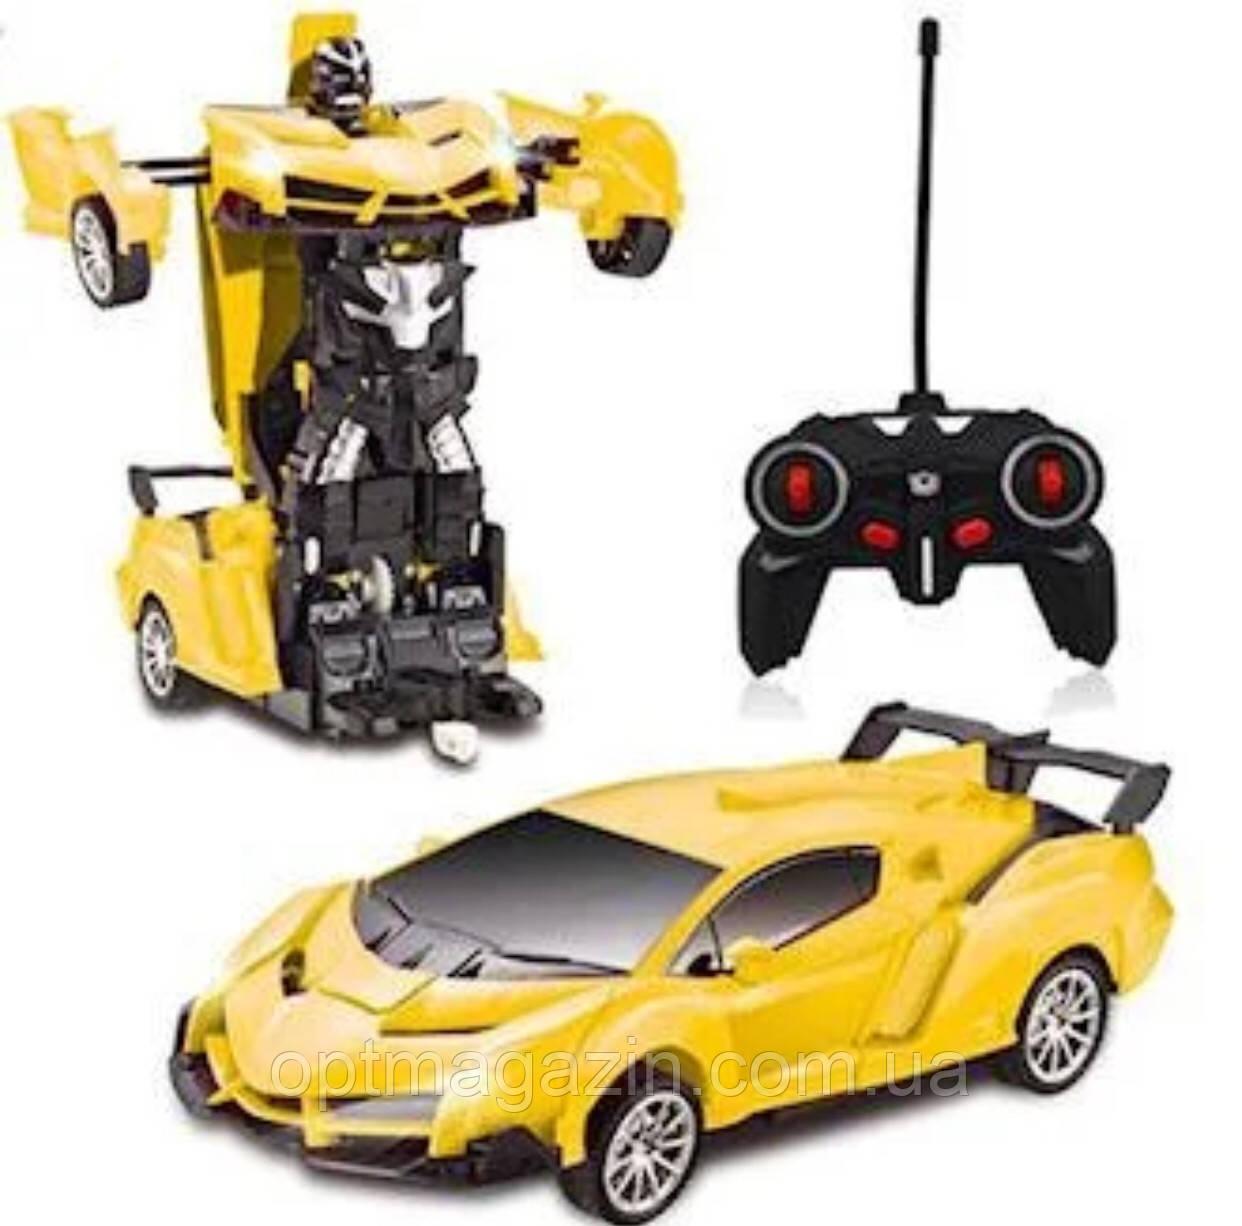 Машинка - робот-трансформер Glorious Mission Critical Ares